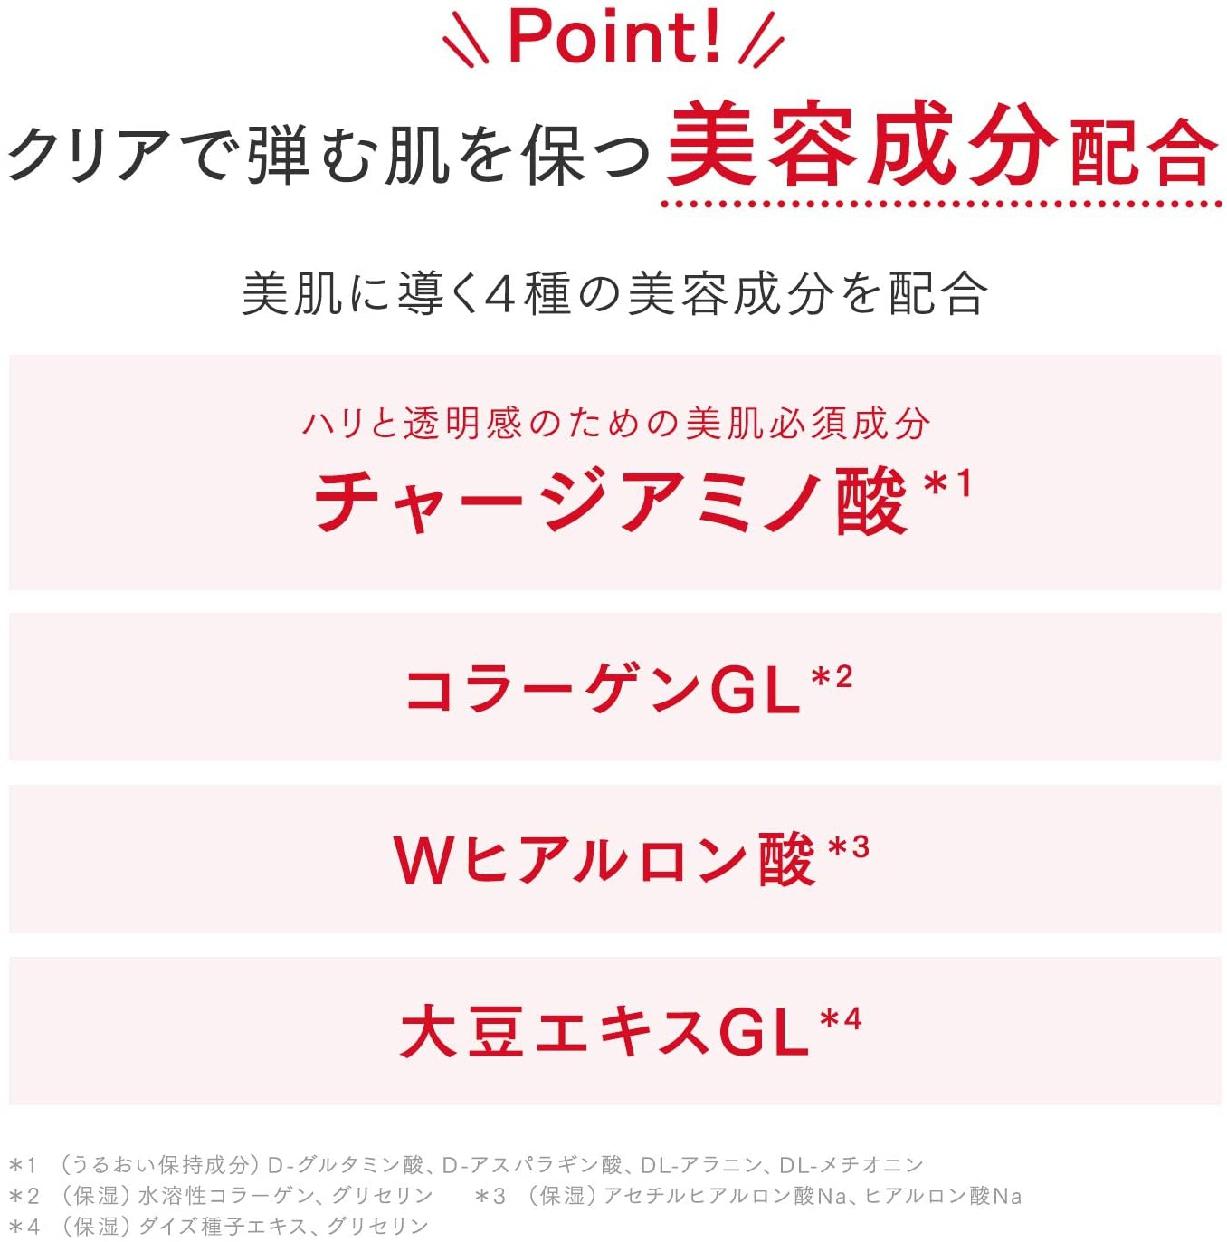 AQUALABEL(アクアレーベル) スペシャルジェルクリームA (モイスト)の商品画像10